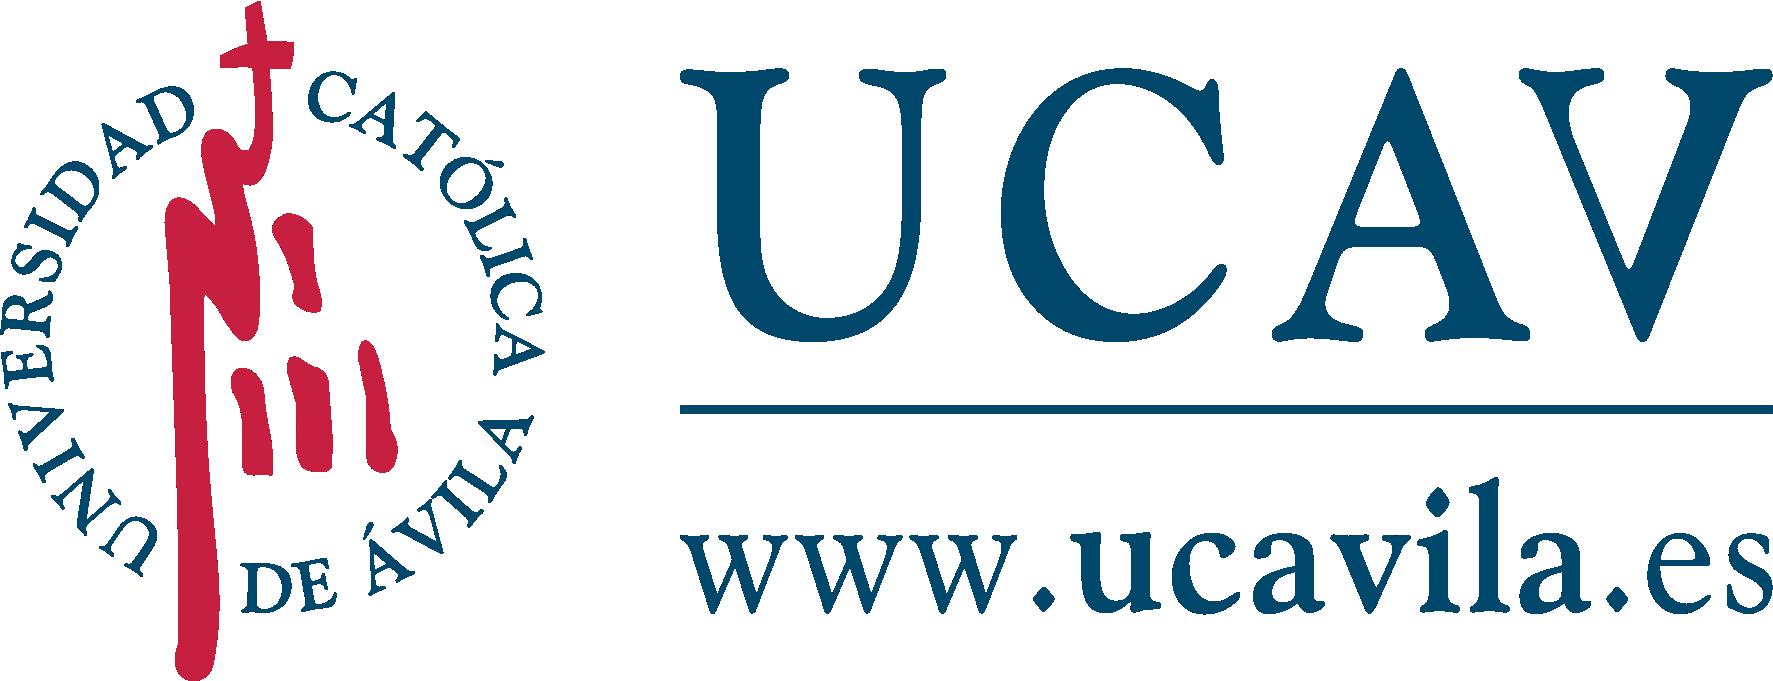 logo-eduma-the-best-lms-wordpress-theme